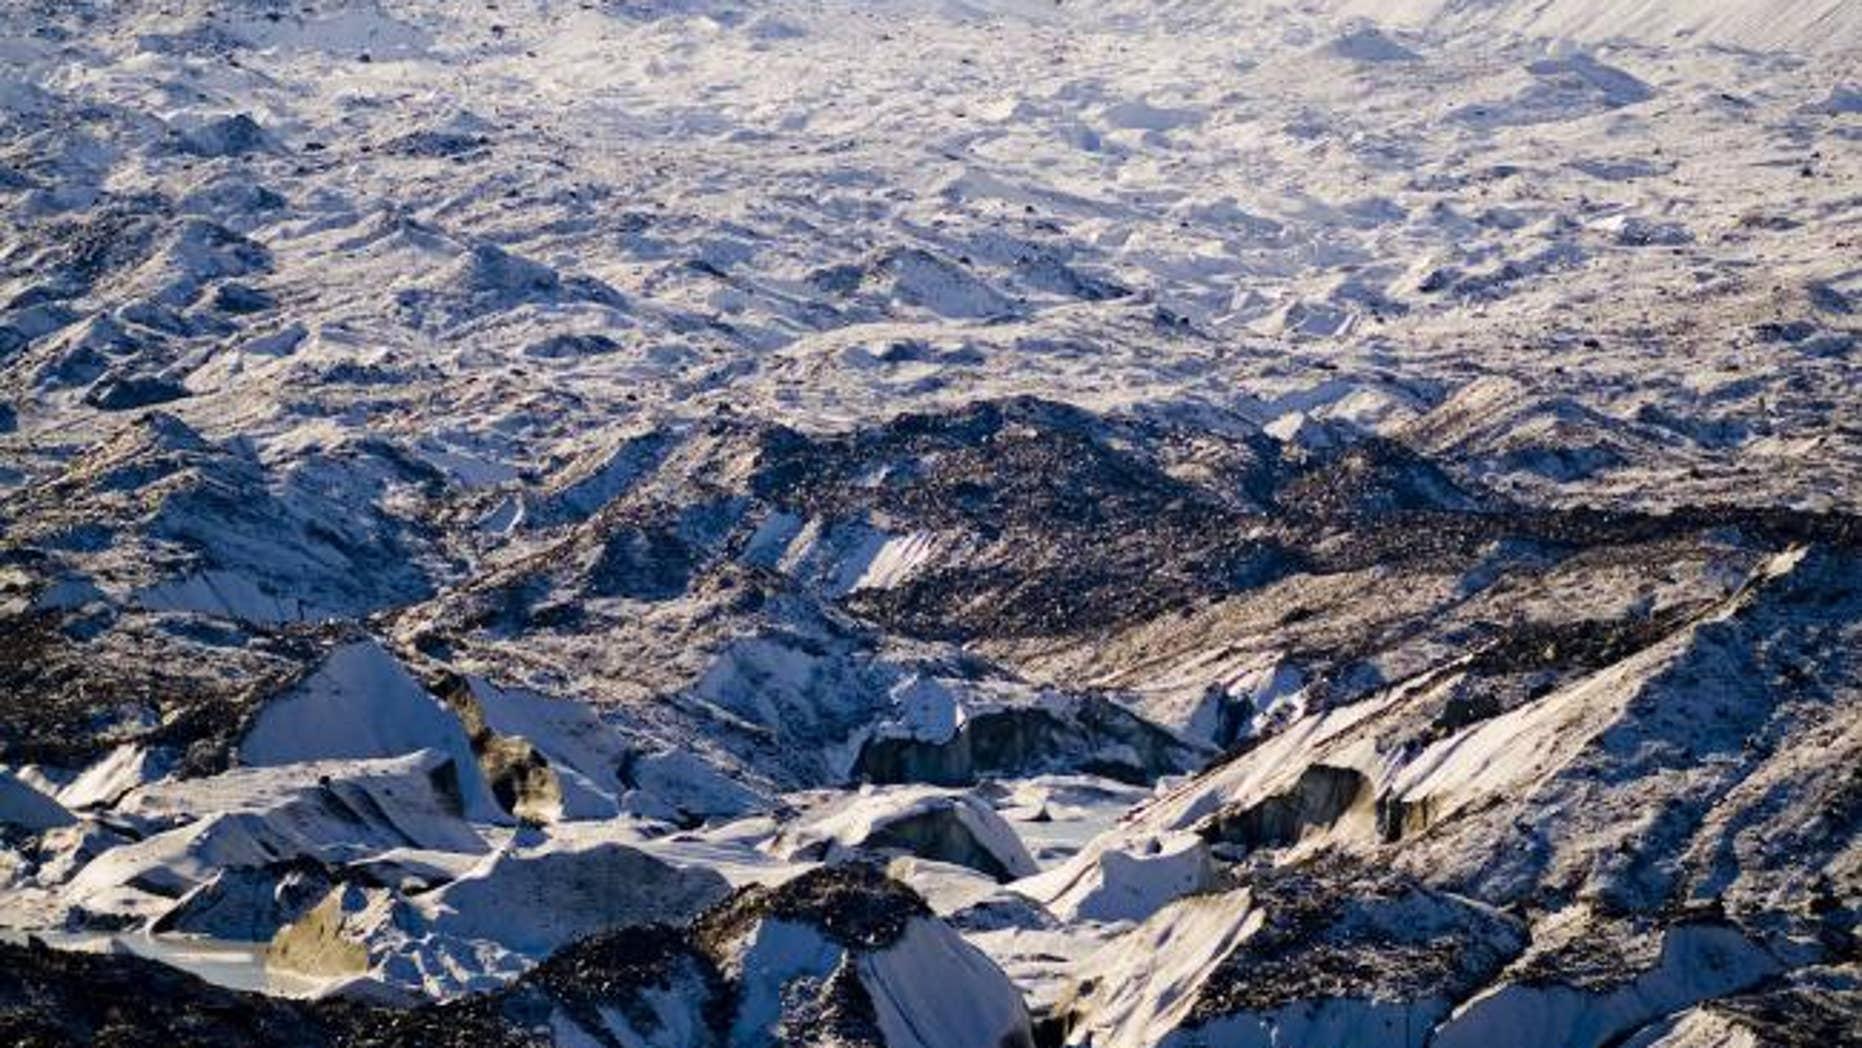 Aoraki/Mt Cook National Park, New Zealand (News Limited via News.com.au).